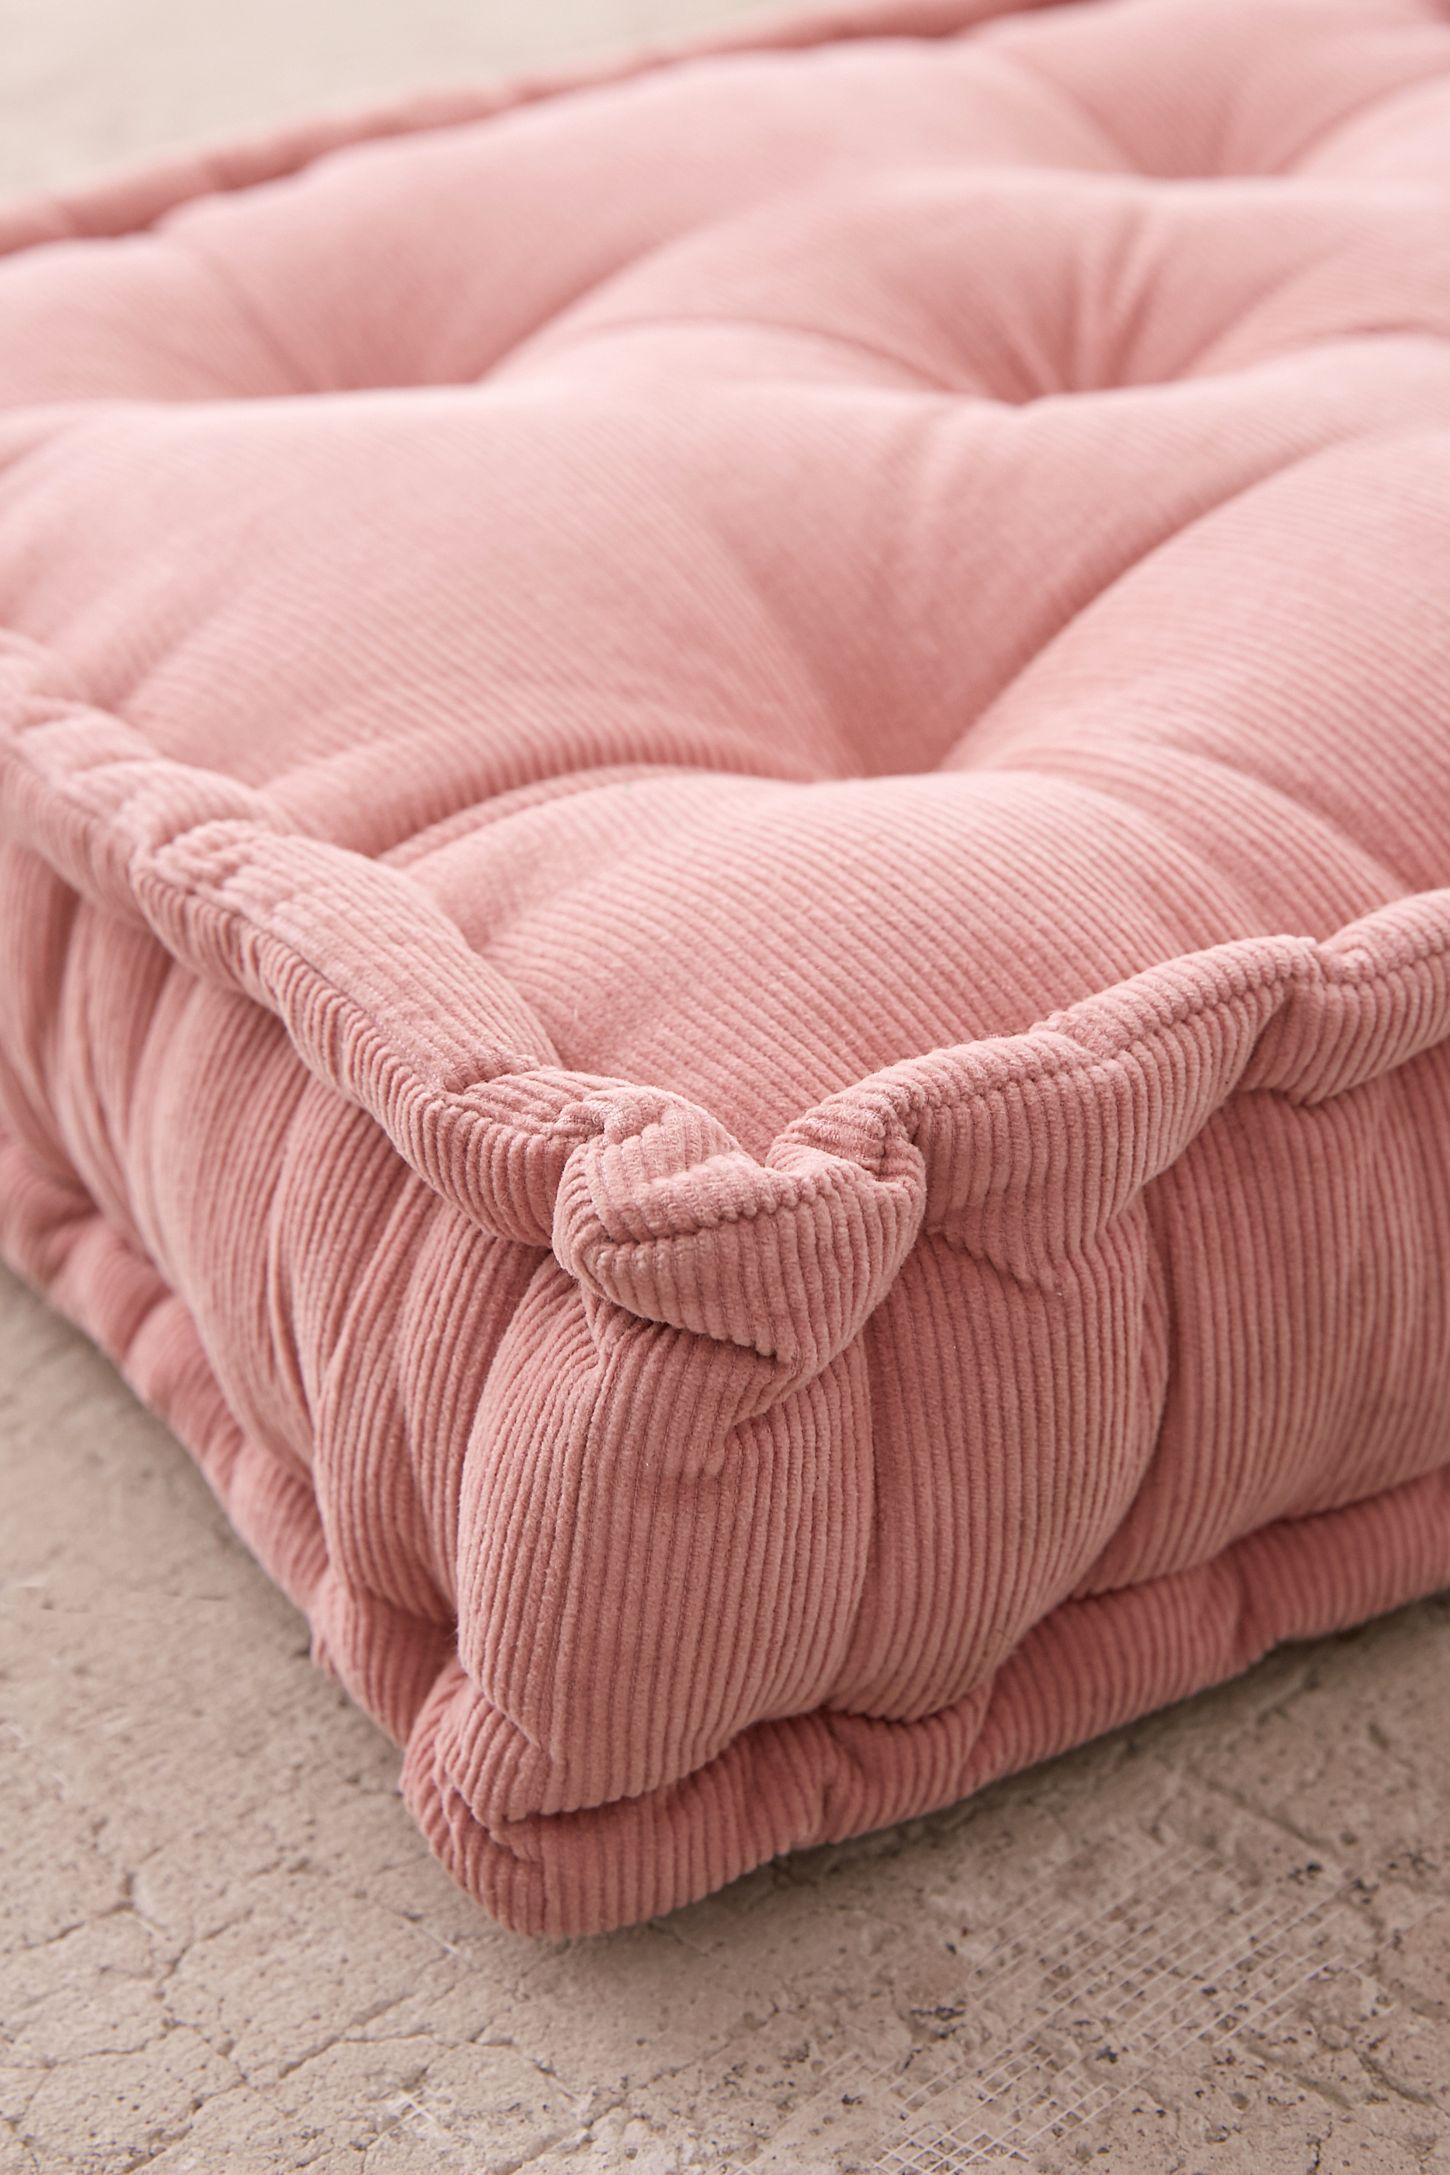 Washed Corduroy Floor Pillow In 2020 Floor Pillows Mattress Cushion French Mattress Cushion